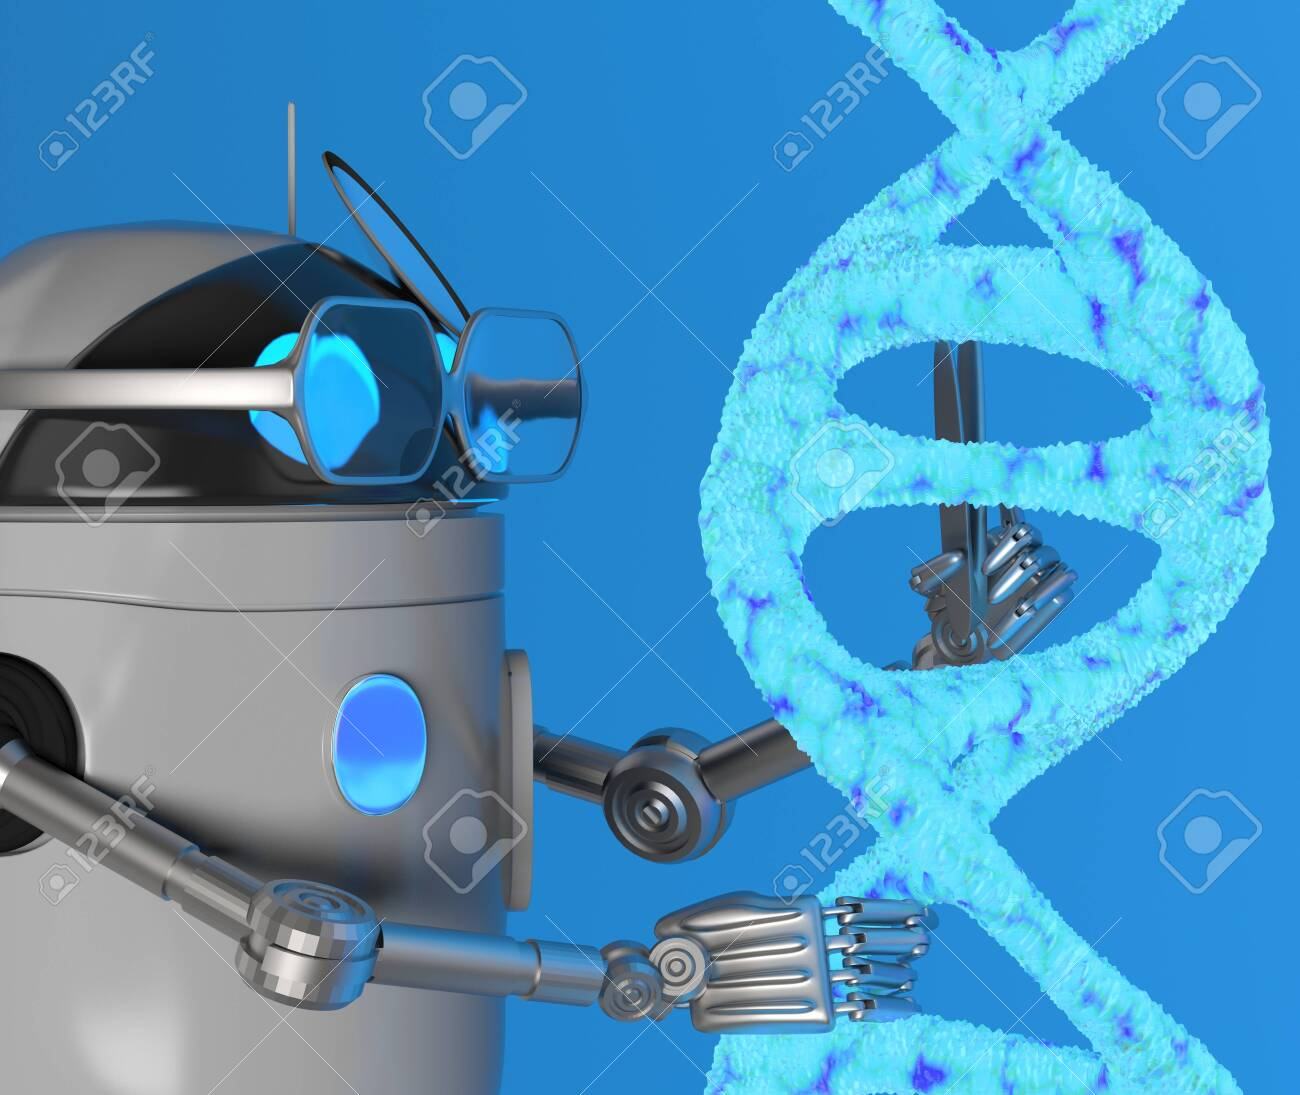 The robot fix Blue Dna molecule,text,3d render. - 131122250